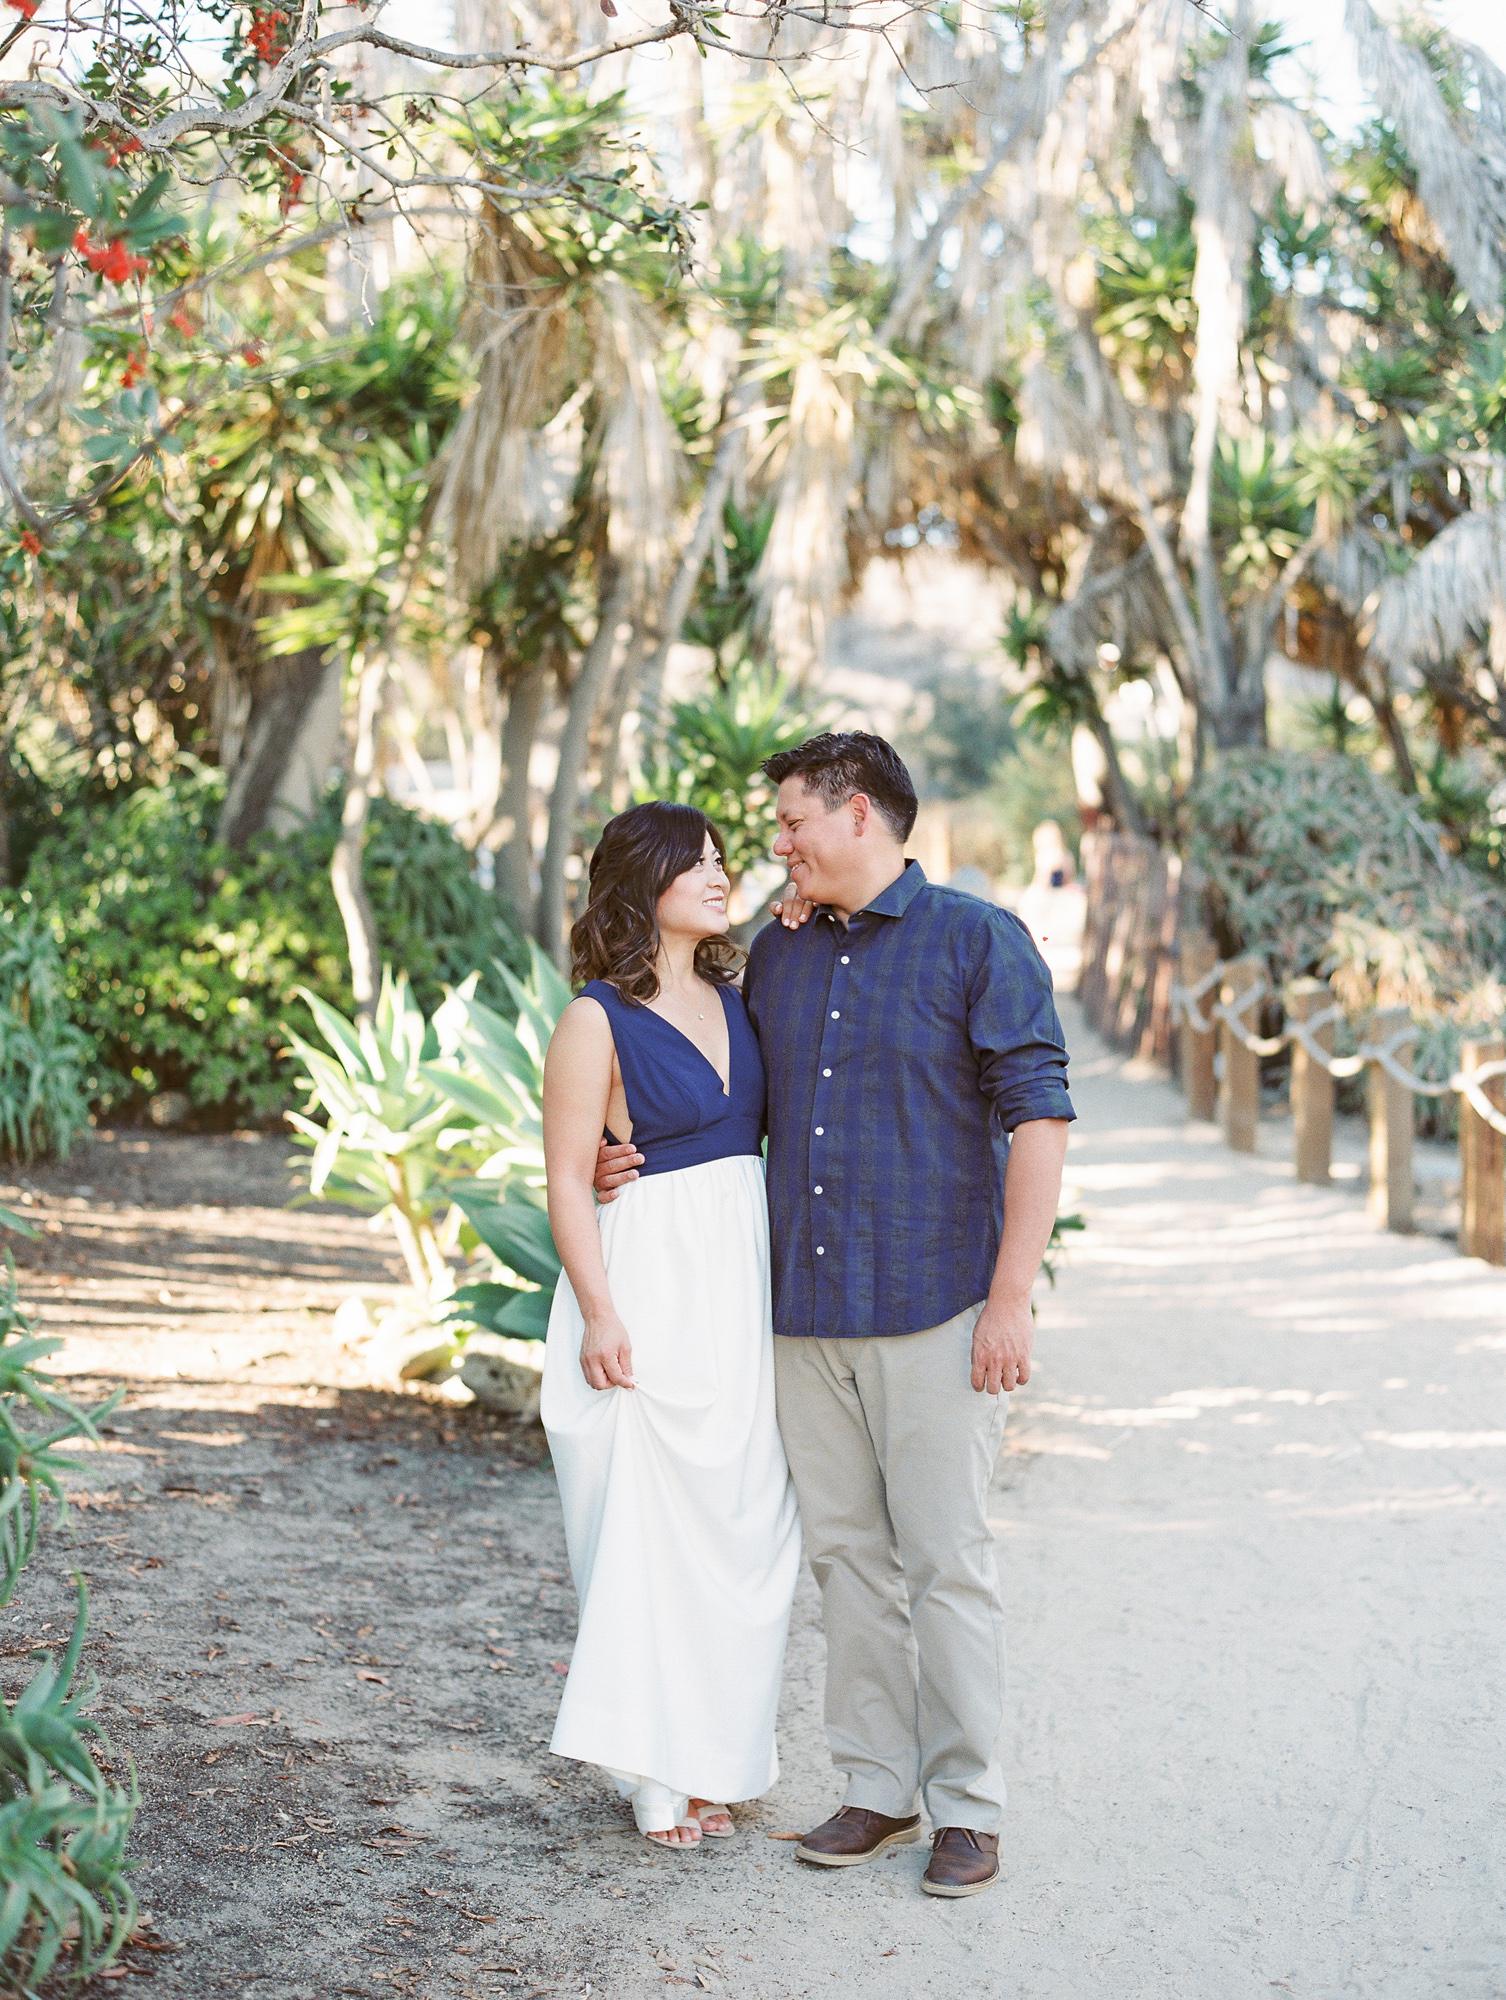 Crystal-Cove-Engagement-Kristina-Adams-2.jpg